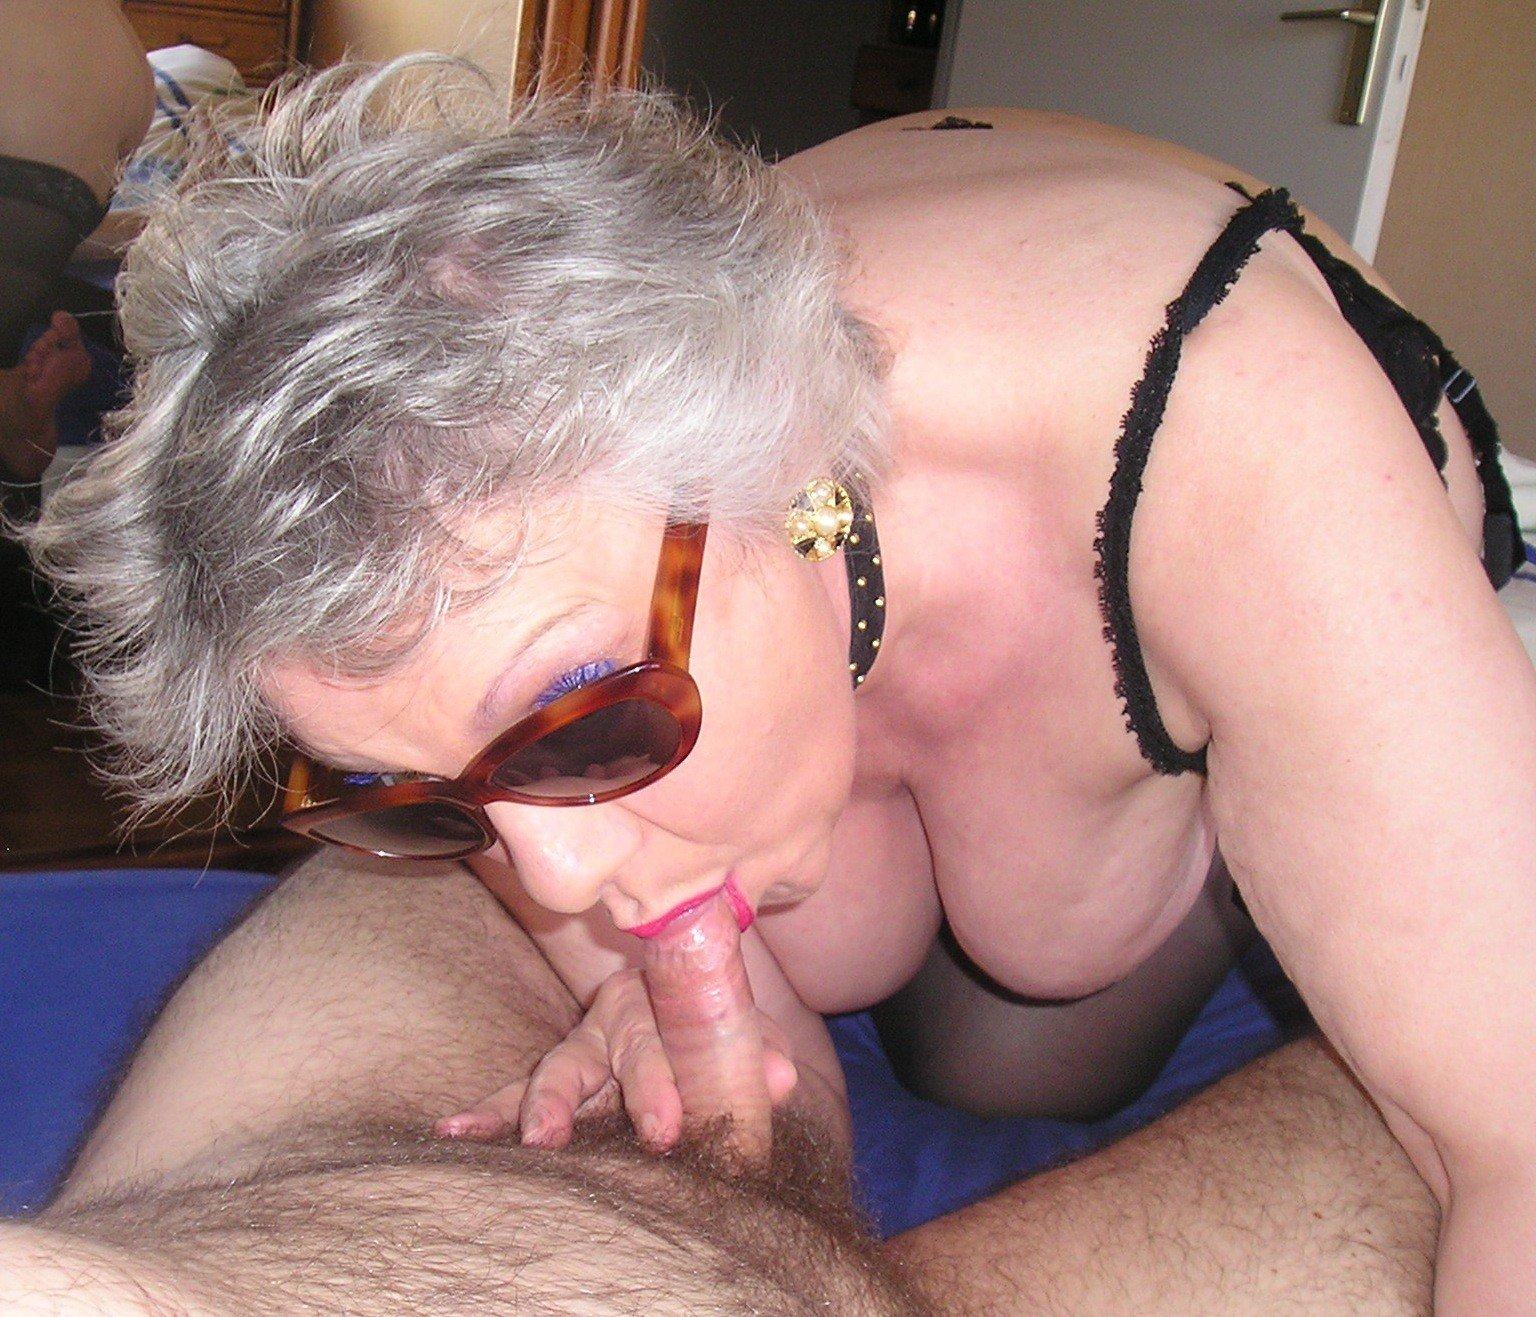 Mature Old Granny Sucking Cock Gif